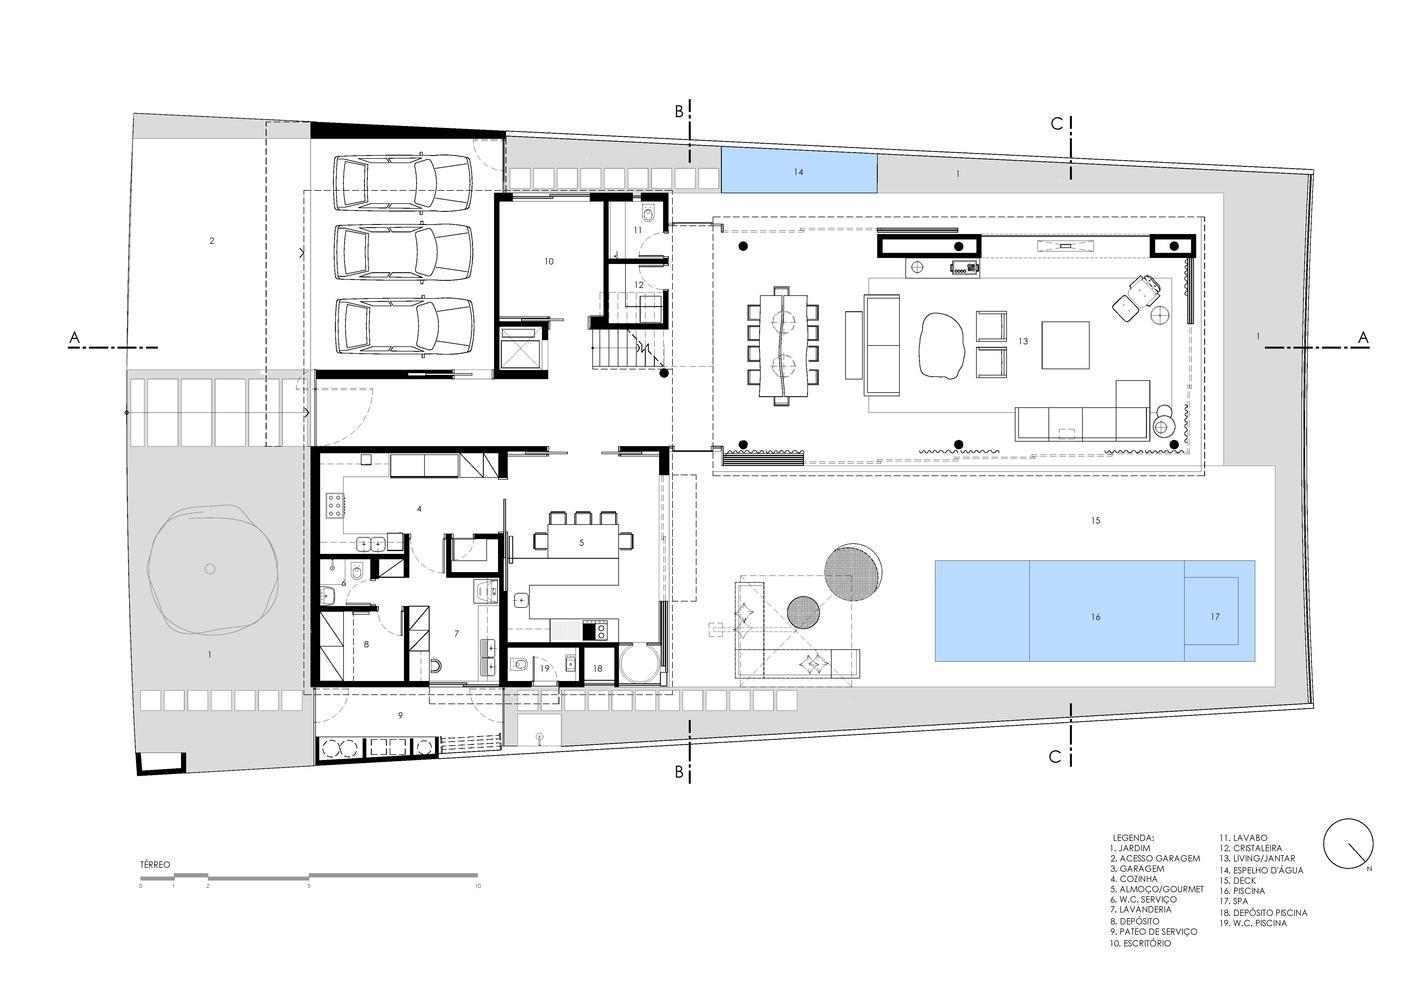 Construir plantas de casas online cole o de criar plantas for Hacer planos a escala